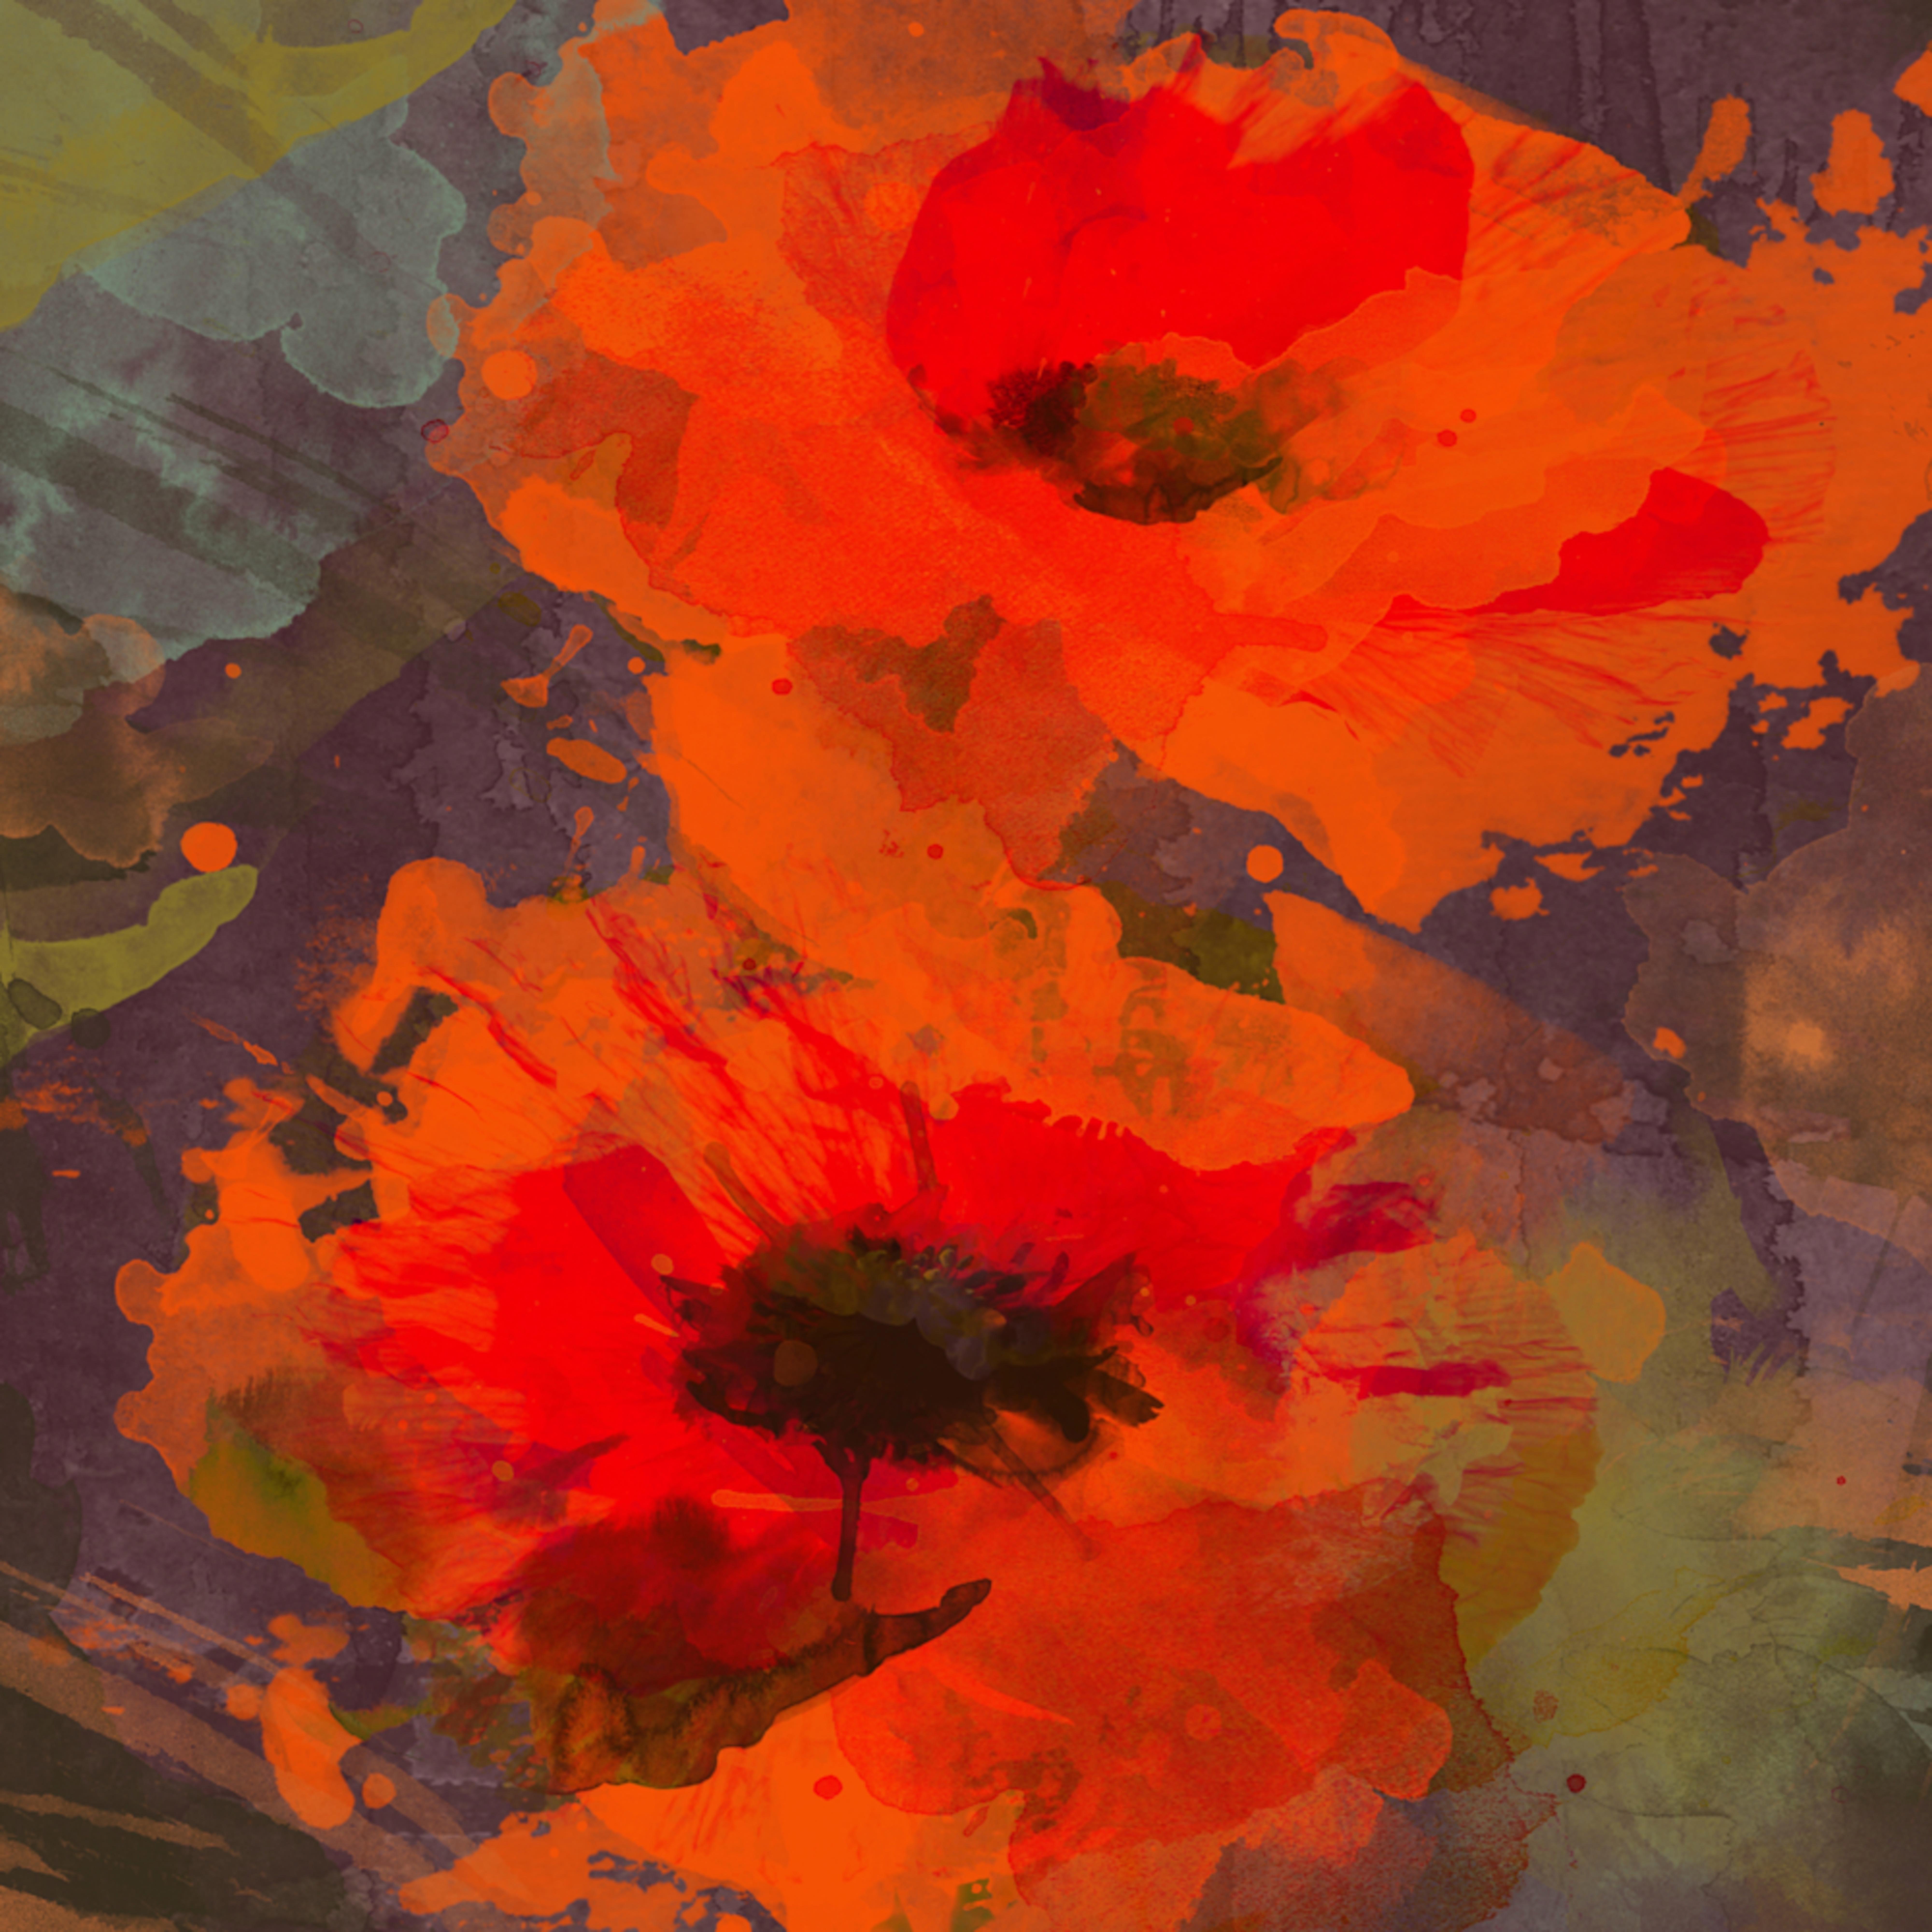 Symphony of poppies u133wf